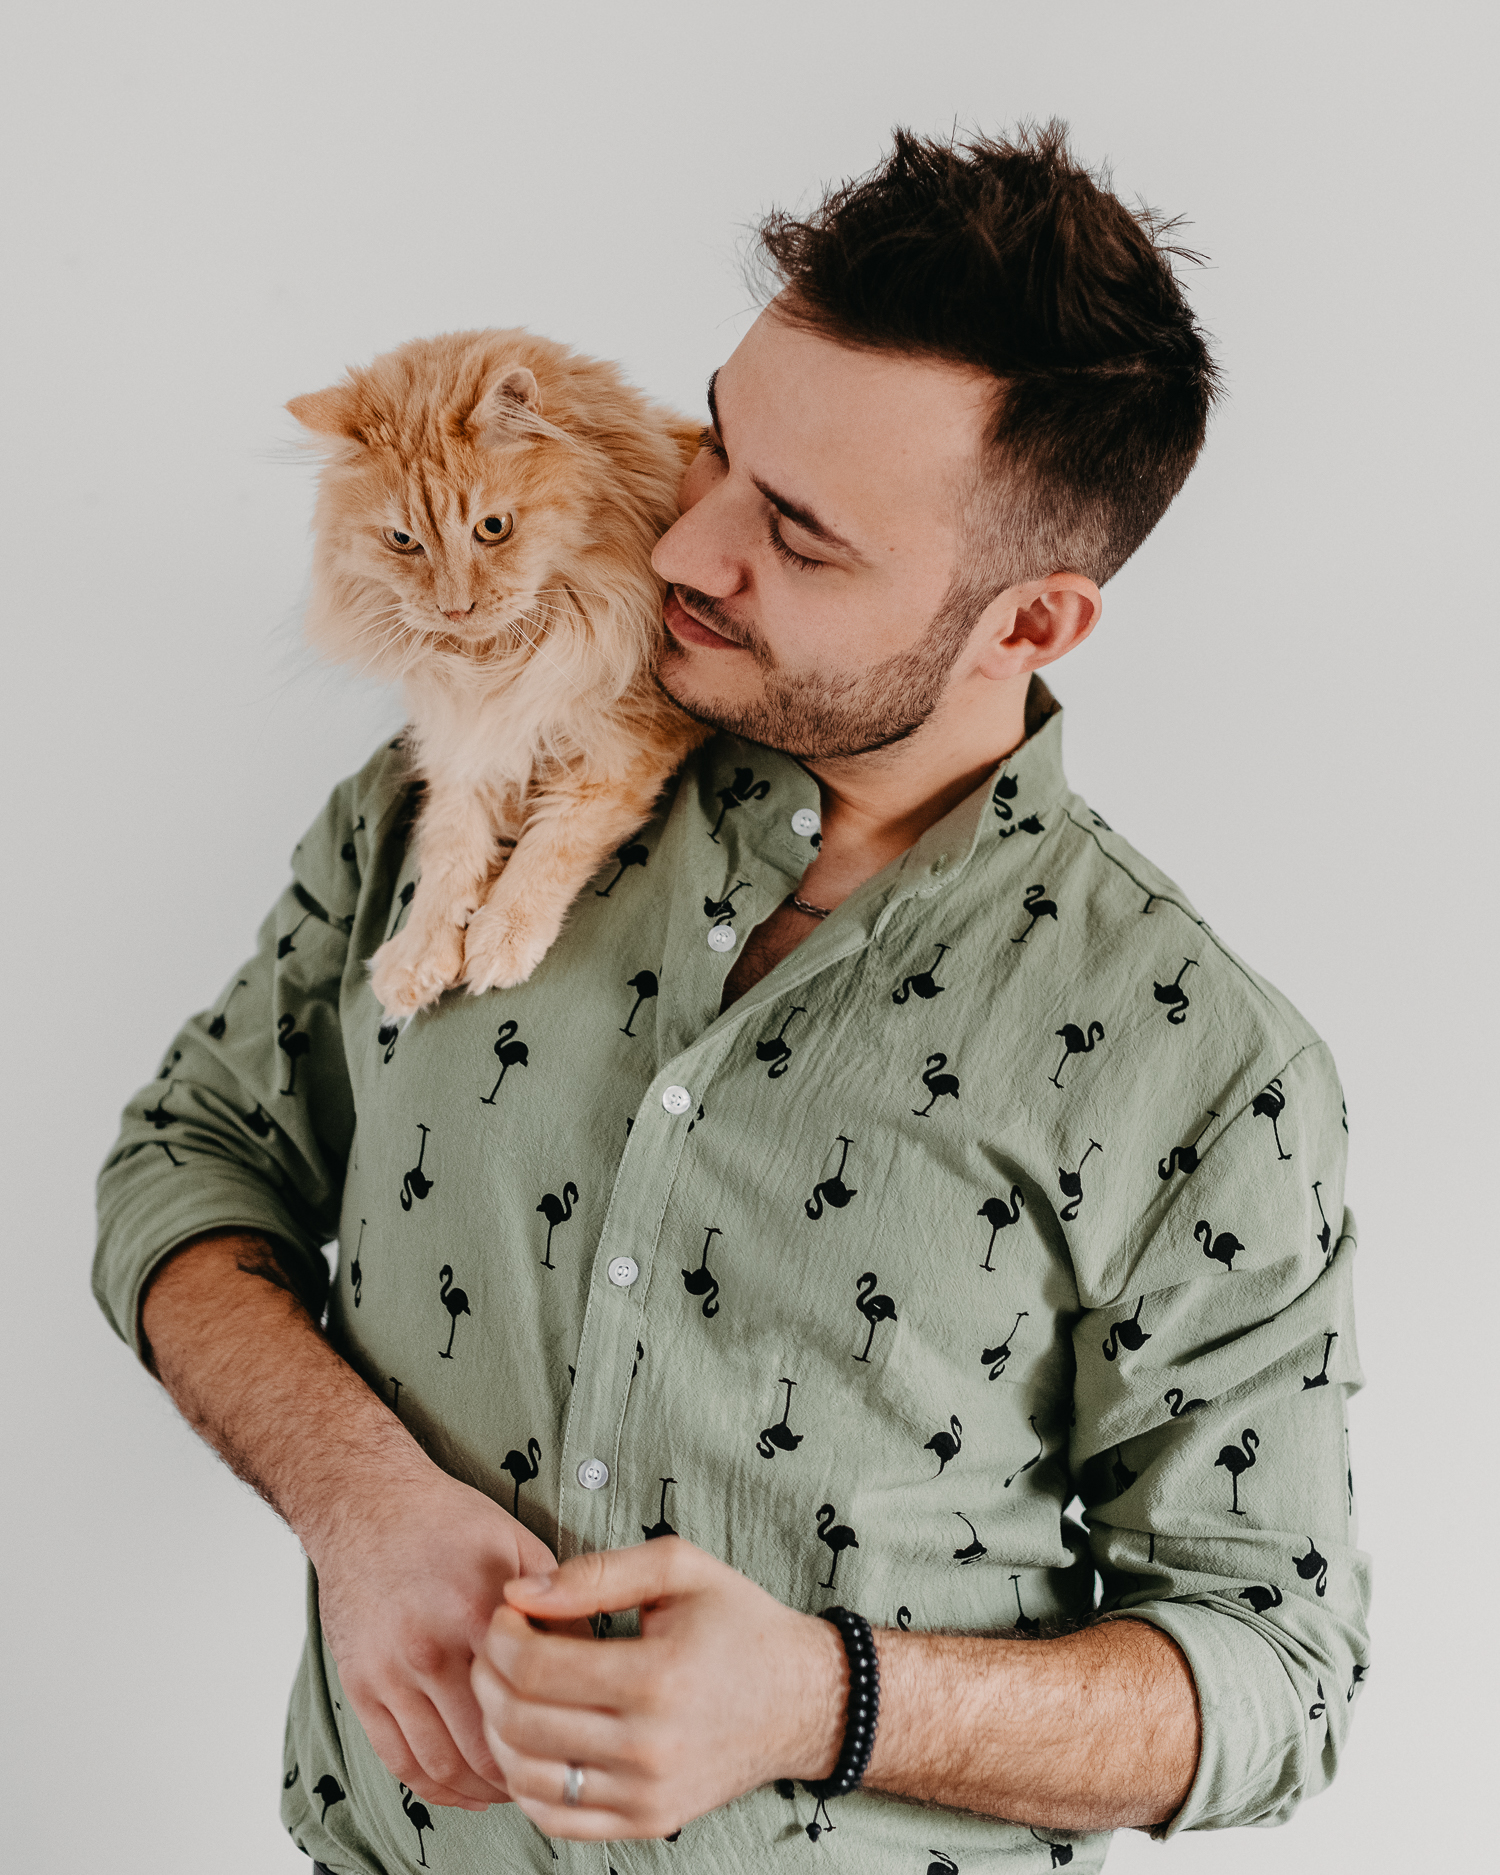 Cute furry orange cat sitting on man's shoulder